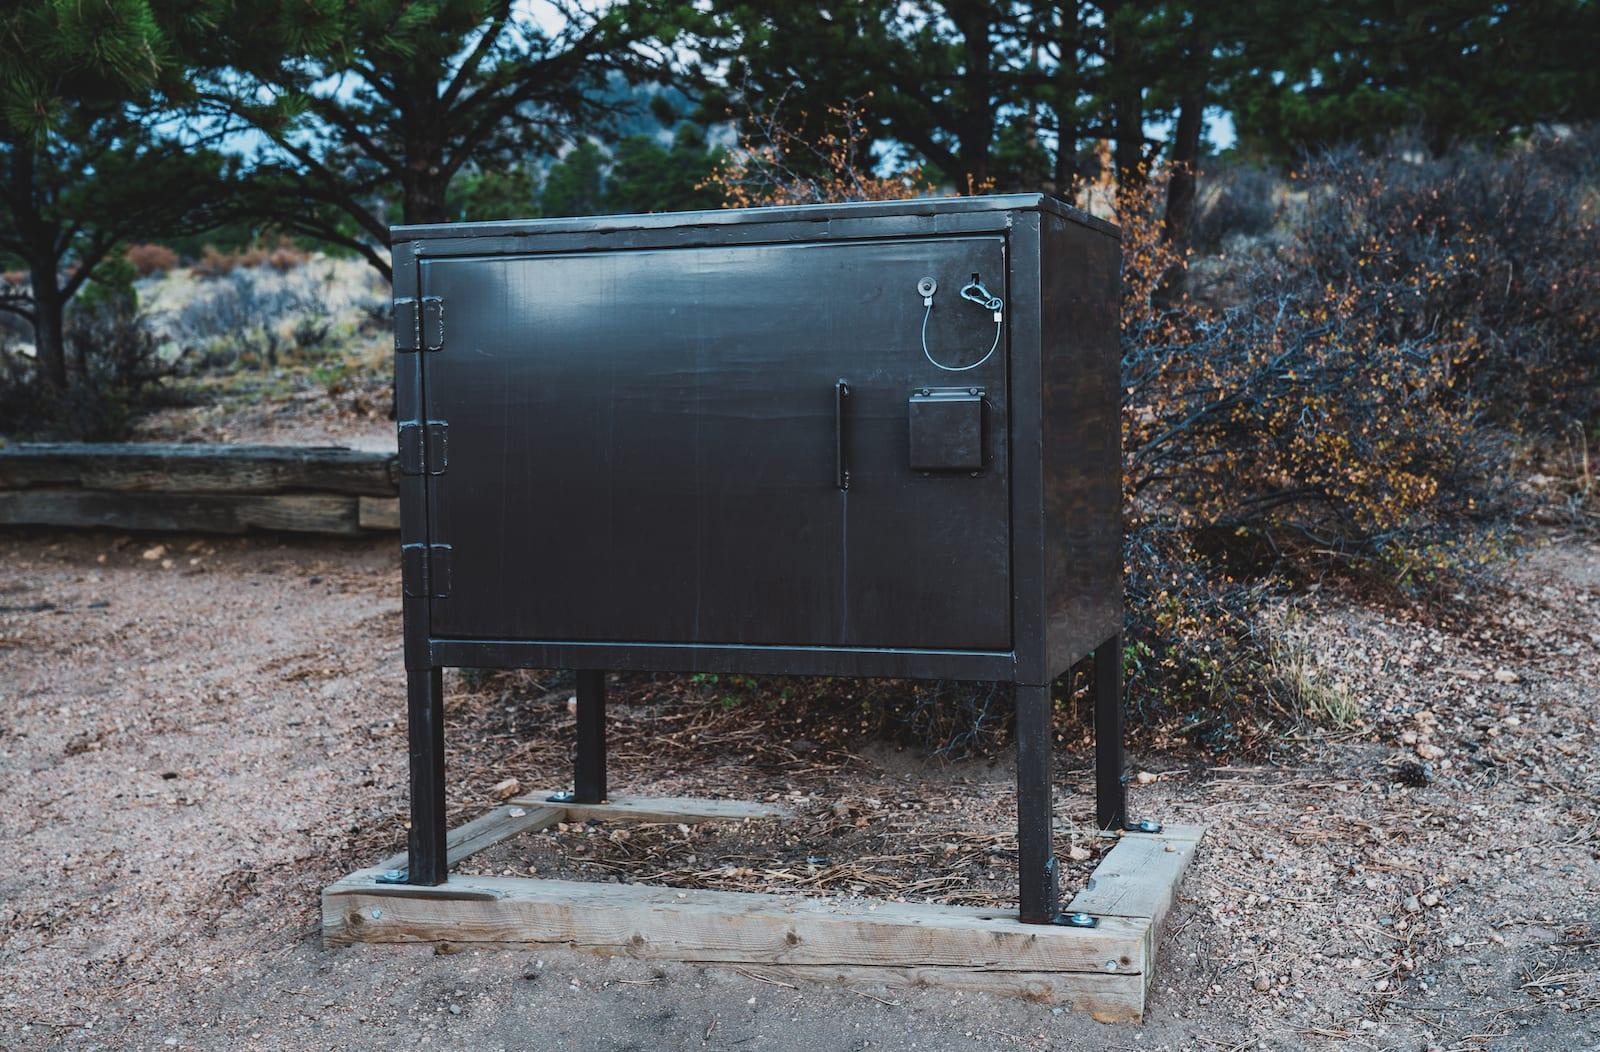 Estes Park Campground at Mary's Lake Bear Storage Box